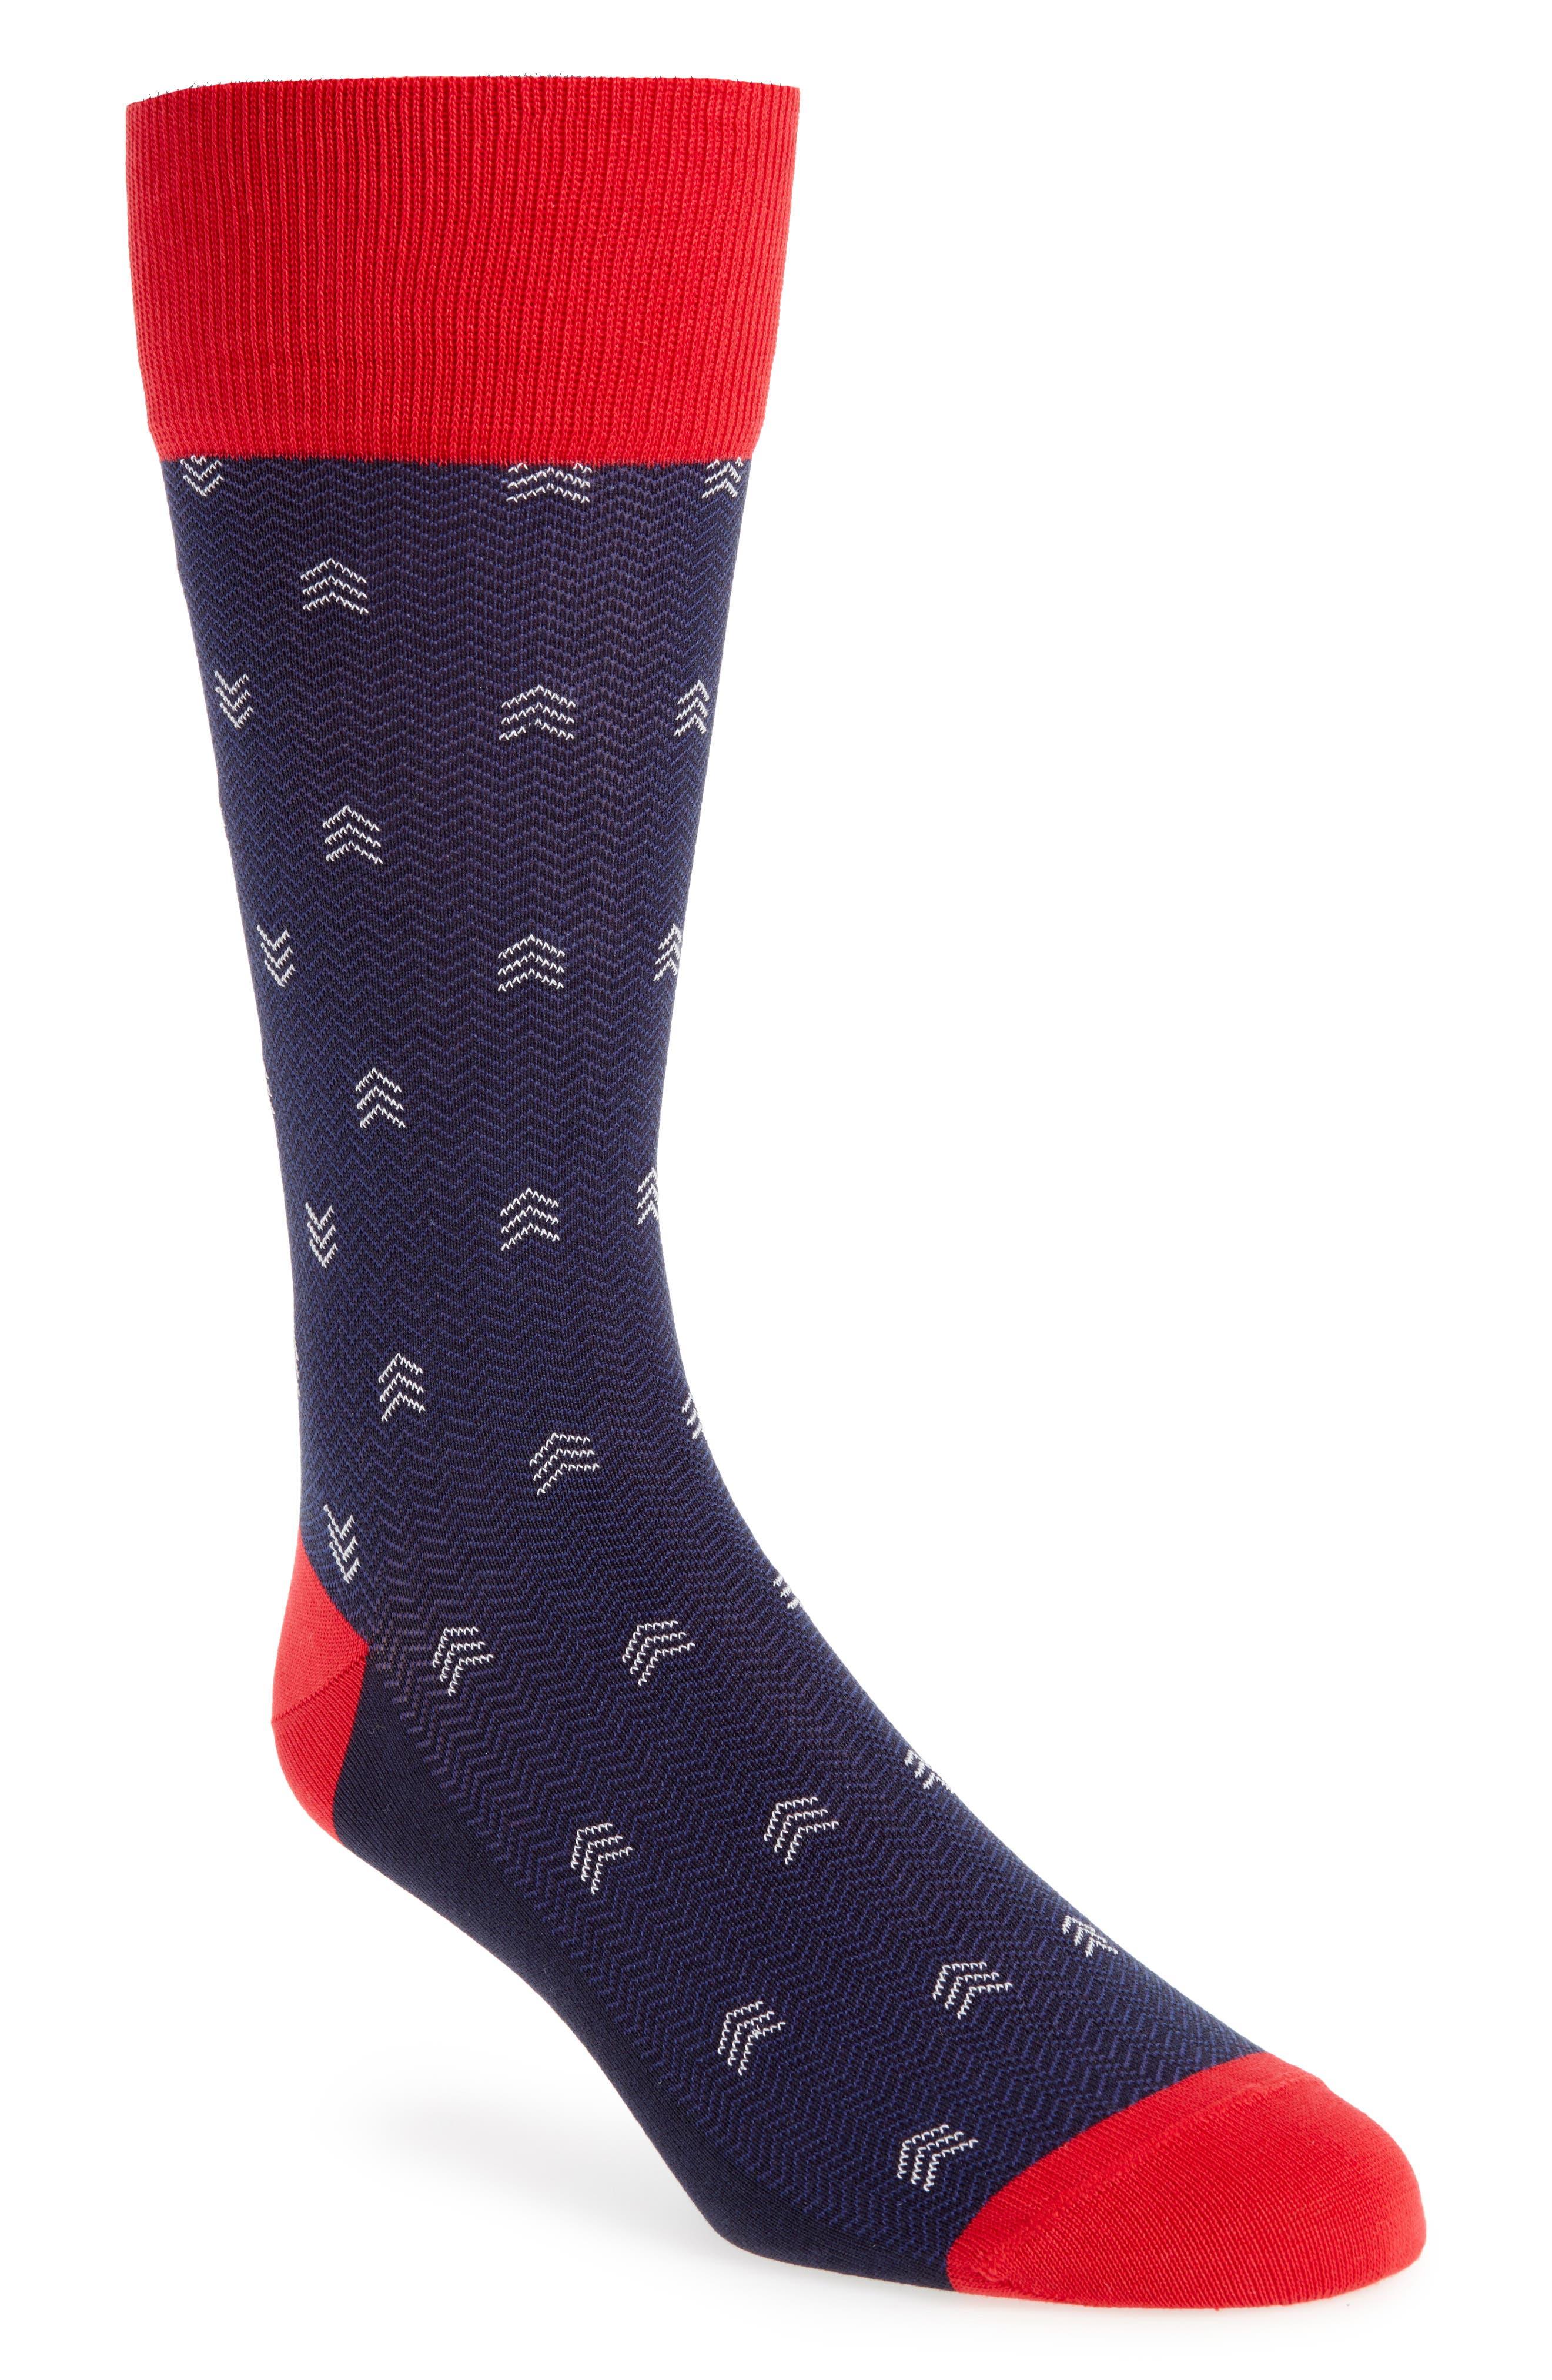 Dancing Chevron Socks,                         Main,                         color, NAVY/ RED